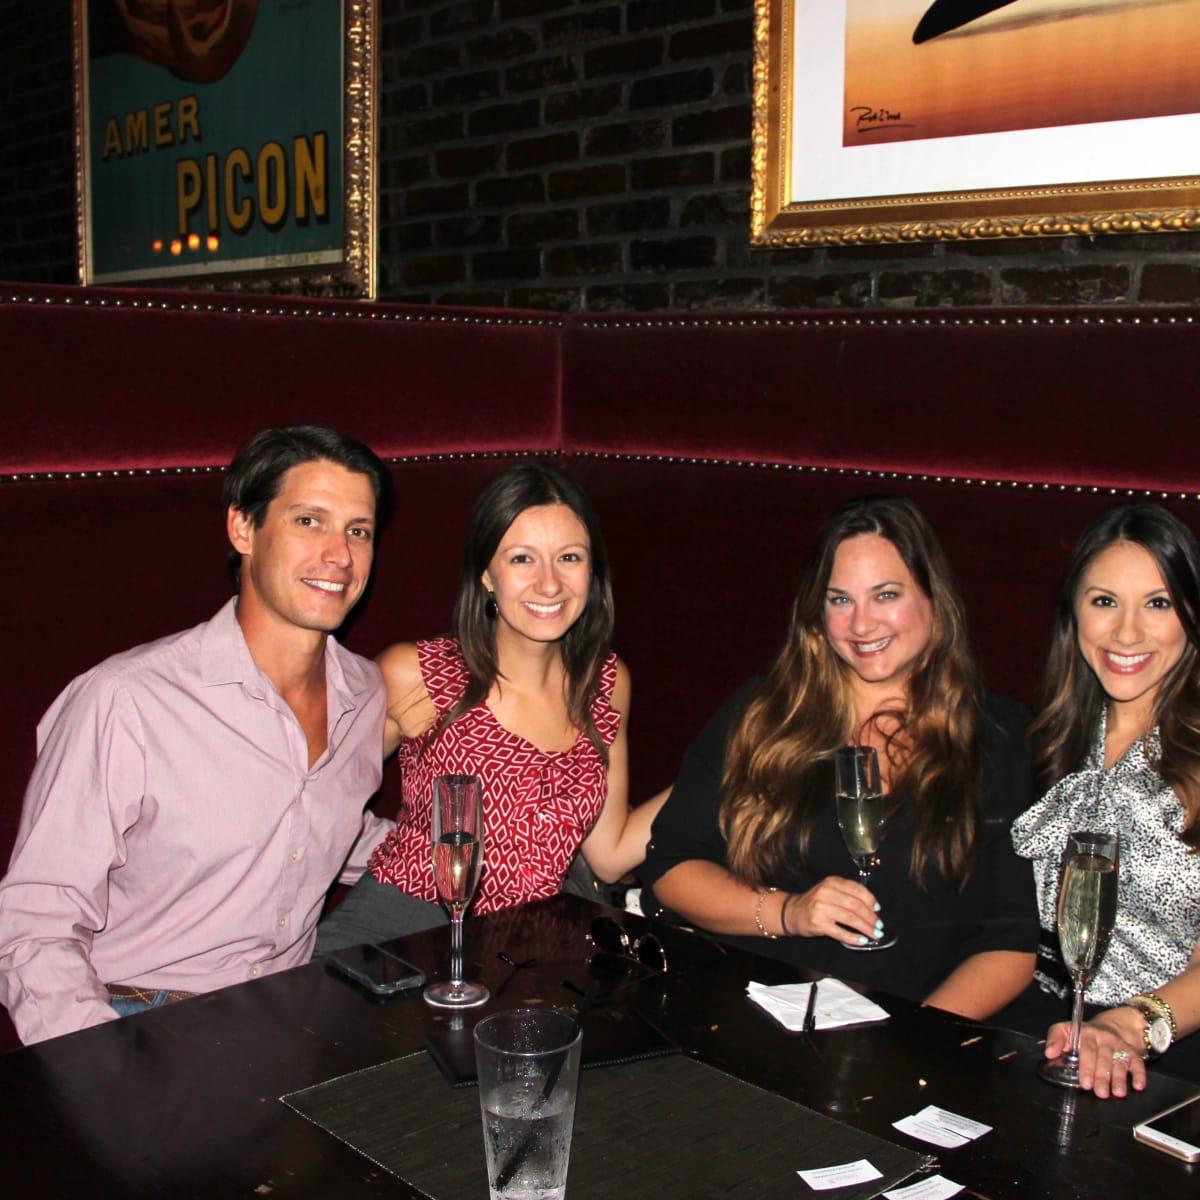 Houston, Friends of Depelchin Back to School Happy Hour, August 2015, Kevin Gilbert, Melissa Gilber, Natasha Paster, Rebecca Cantu